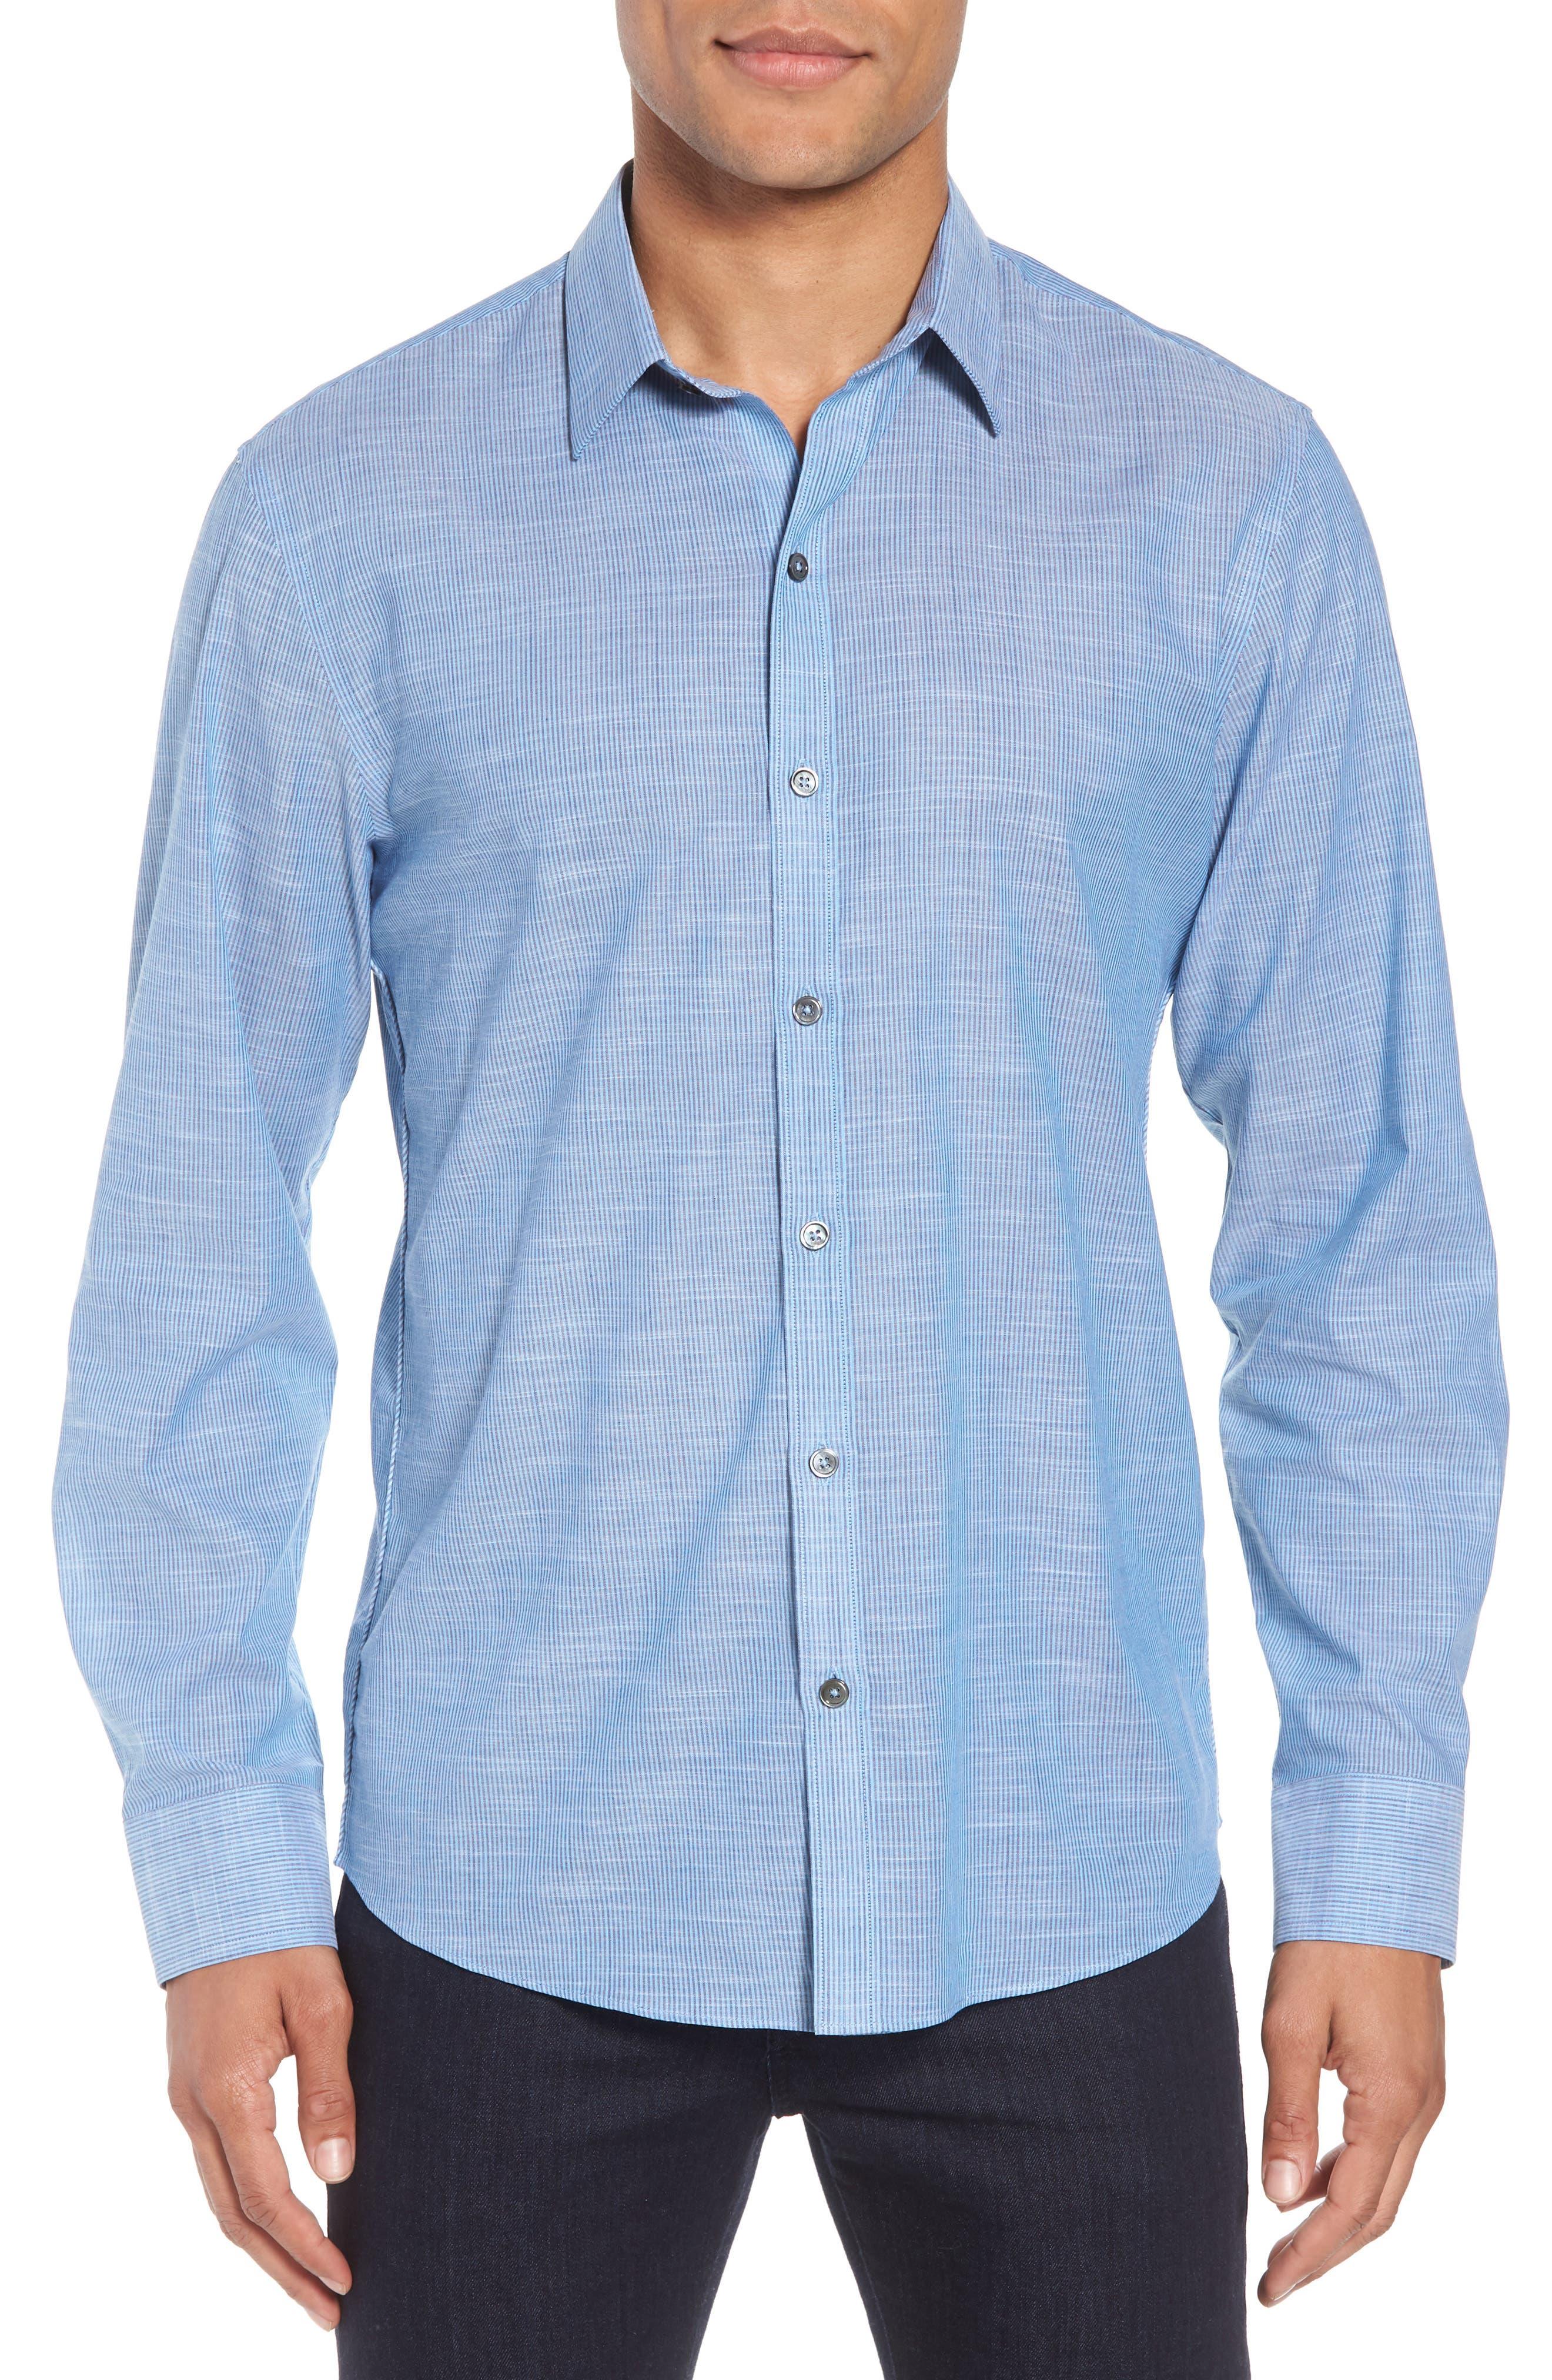 Blumenthal Sport Shirt,                         Main,                         color,